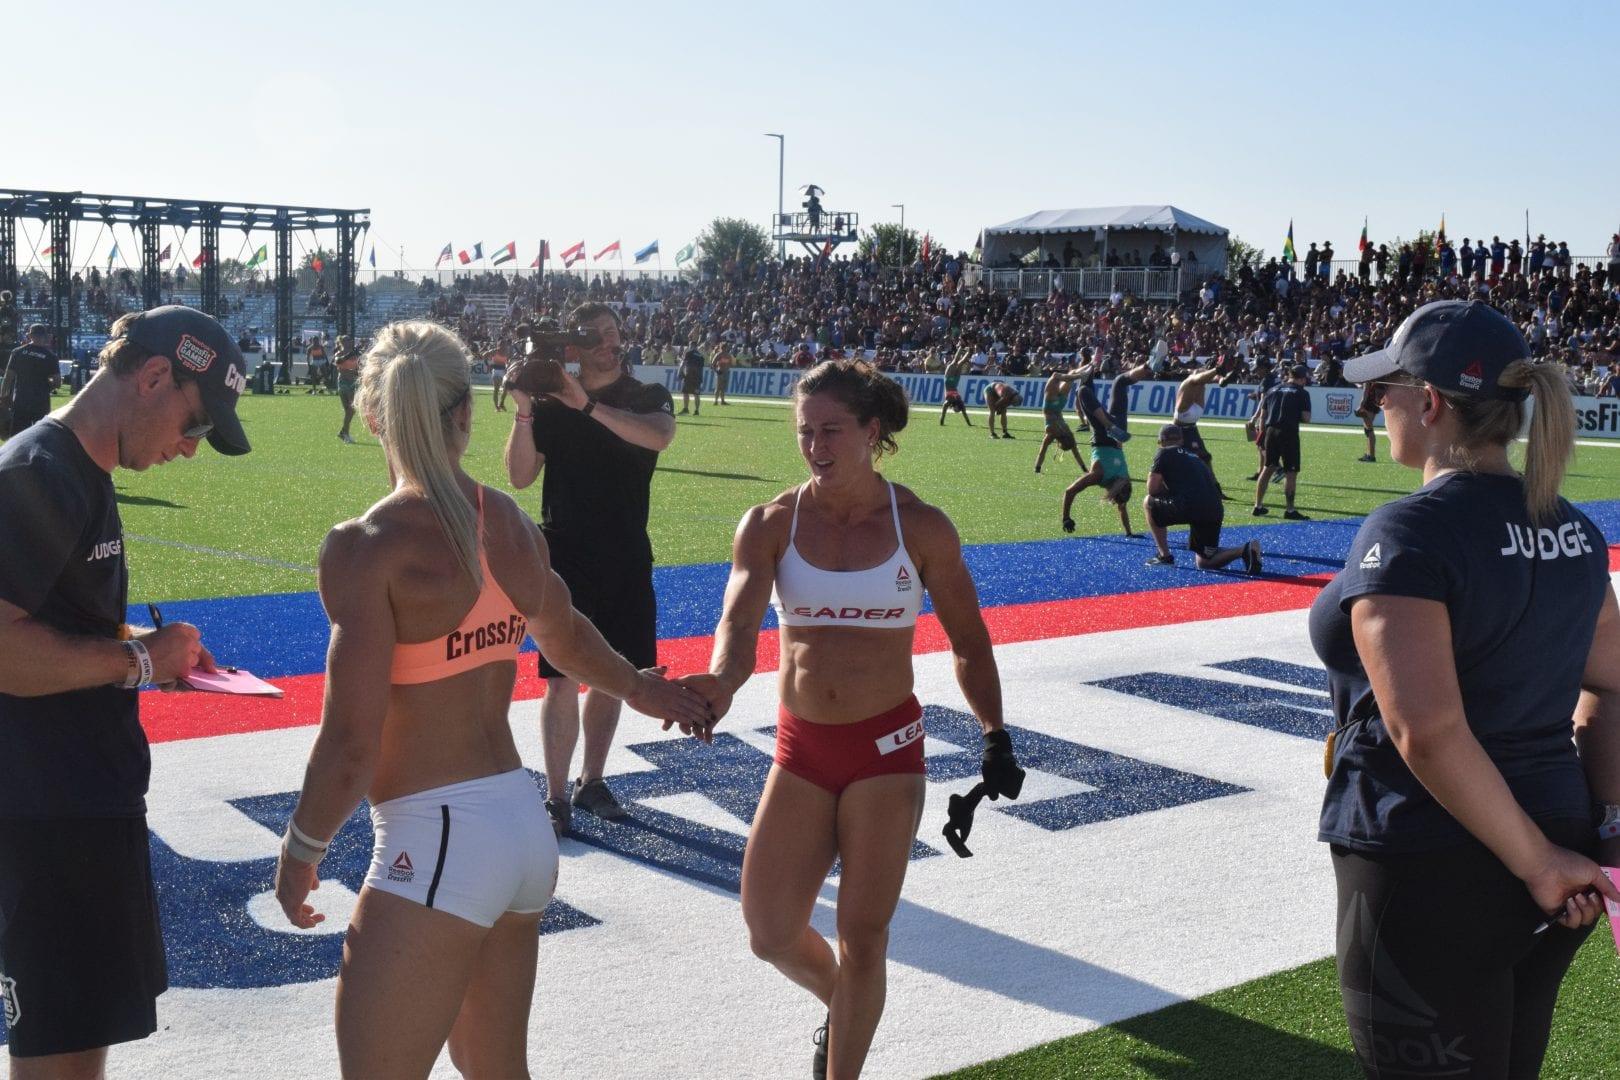 Katrin Davidsdottir gives a hug to Tia-Clair Toomey after an event at the 2019 CrossFit Games